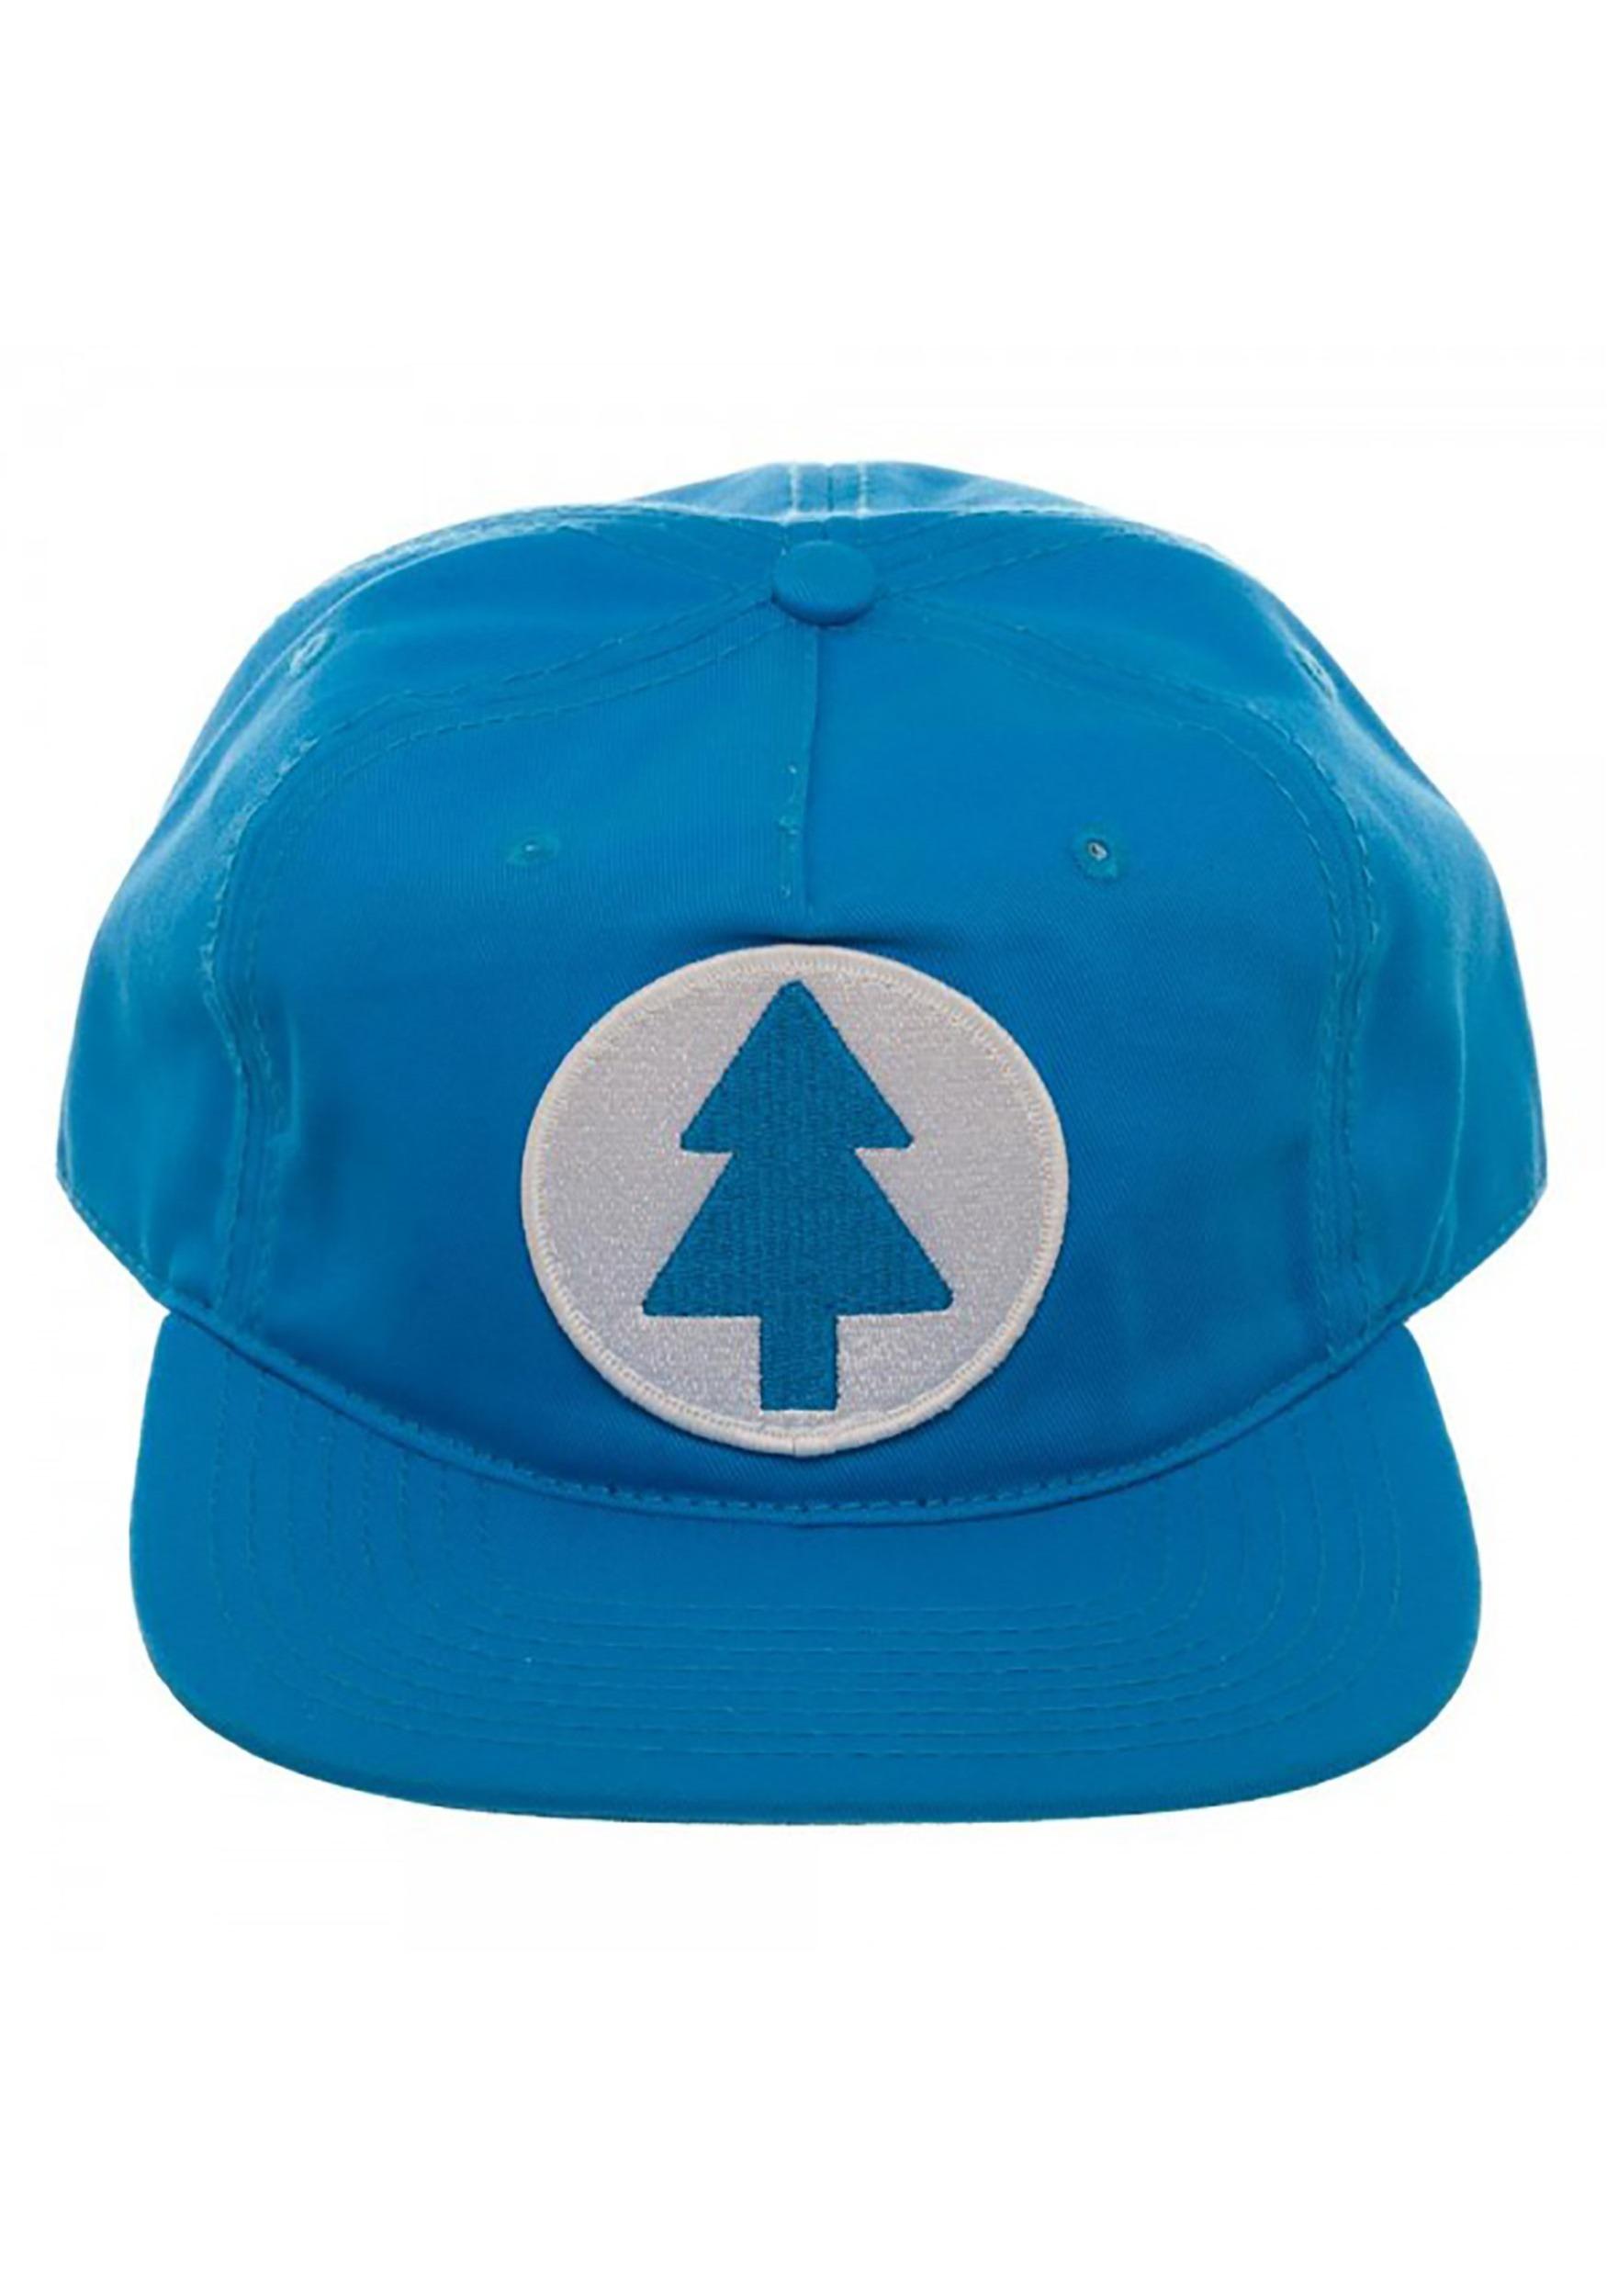 5517062ef Gravity Falls Dipper Pines Snapback Cap